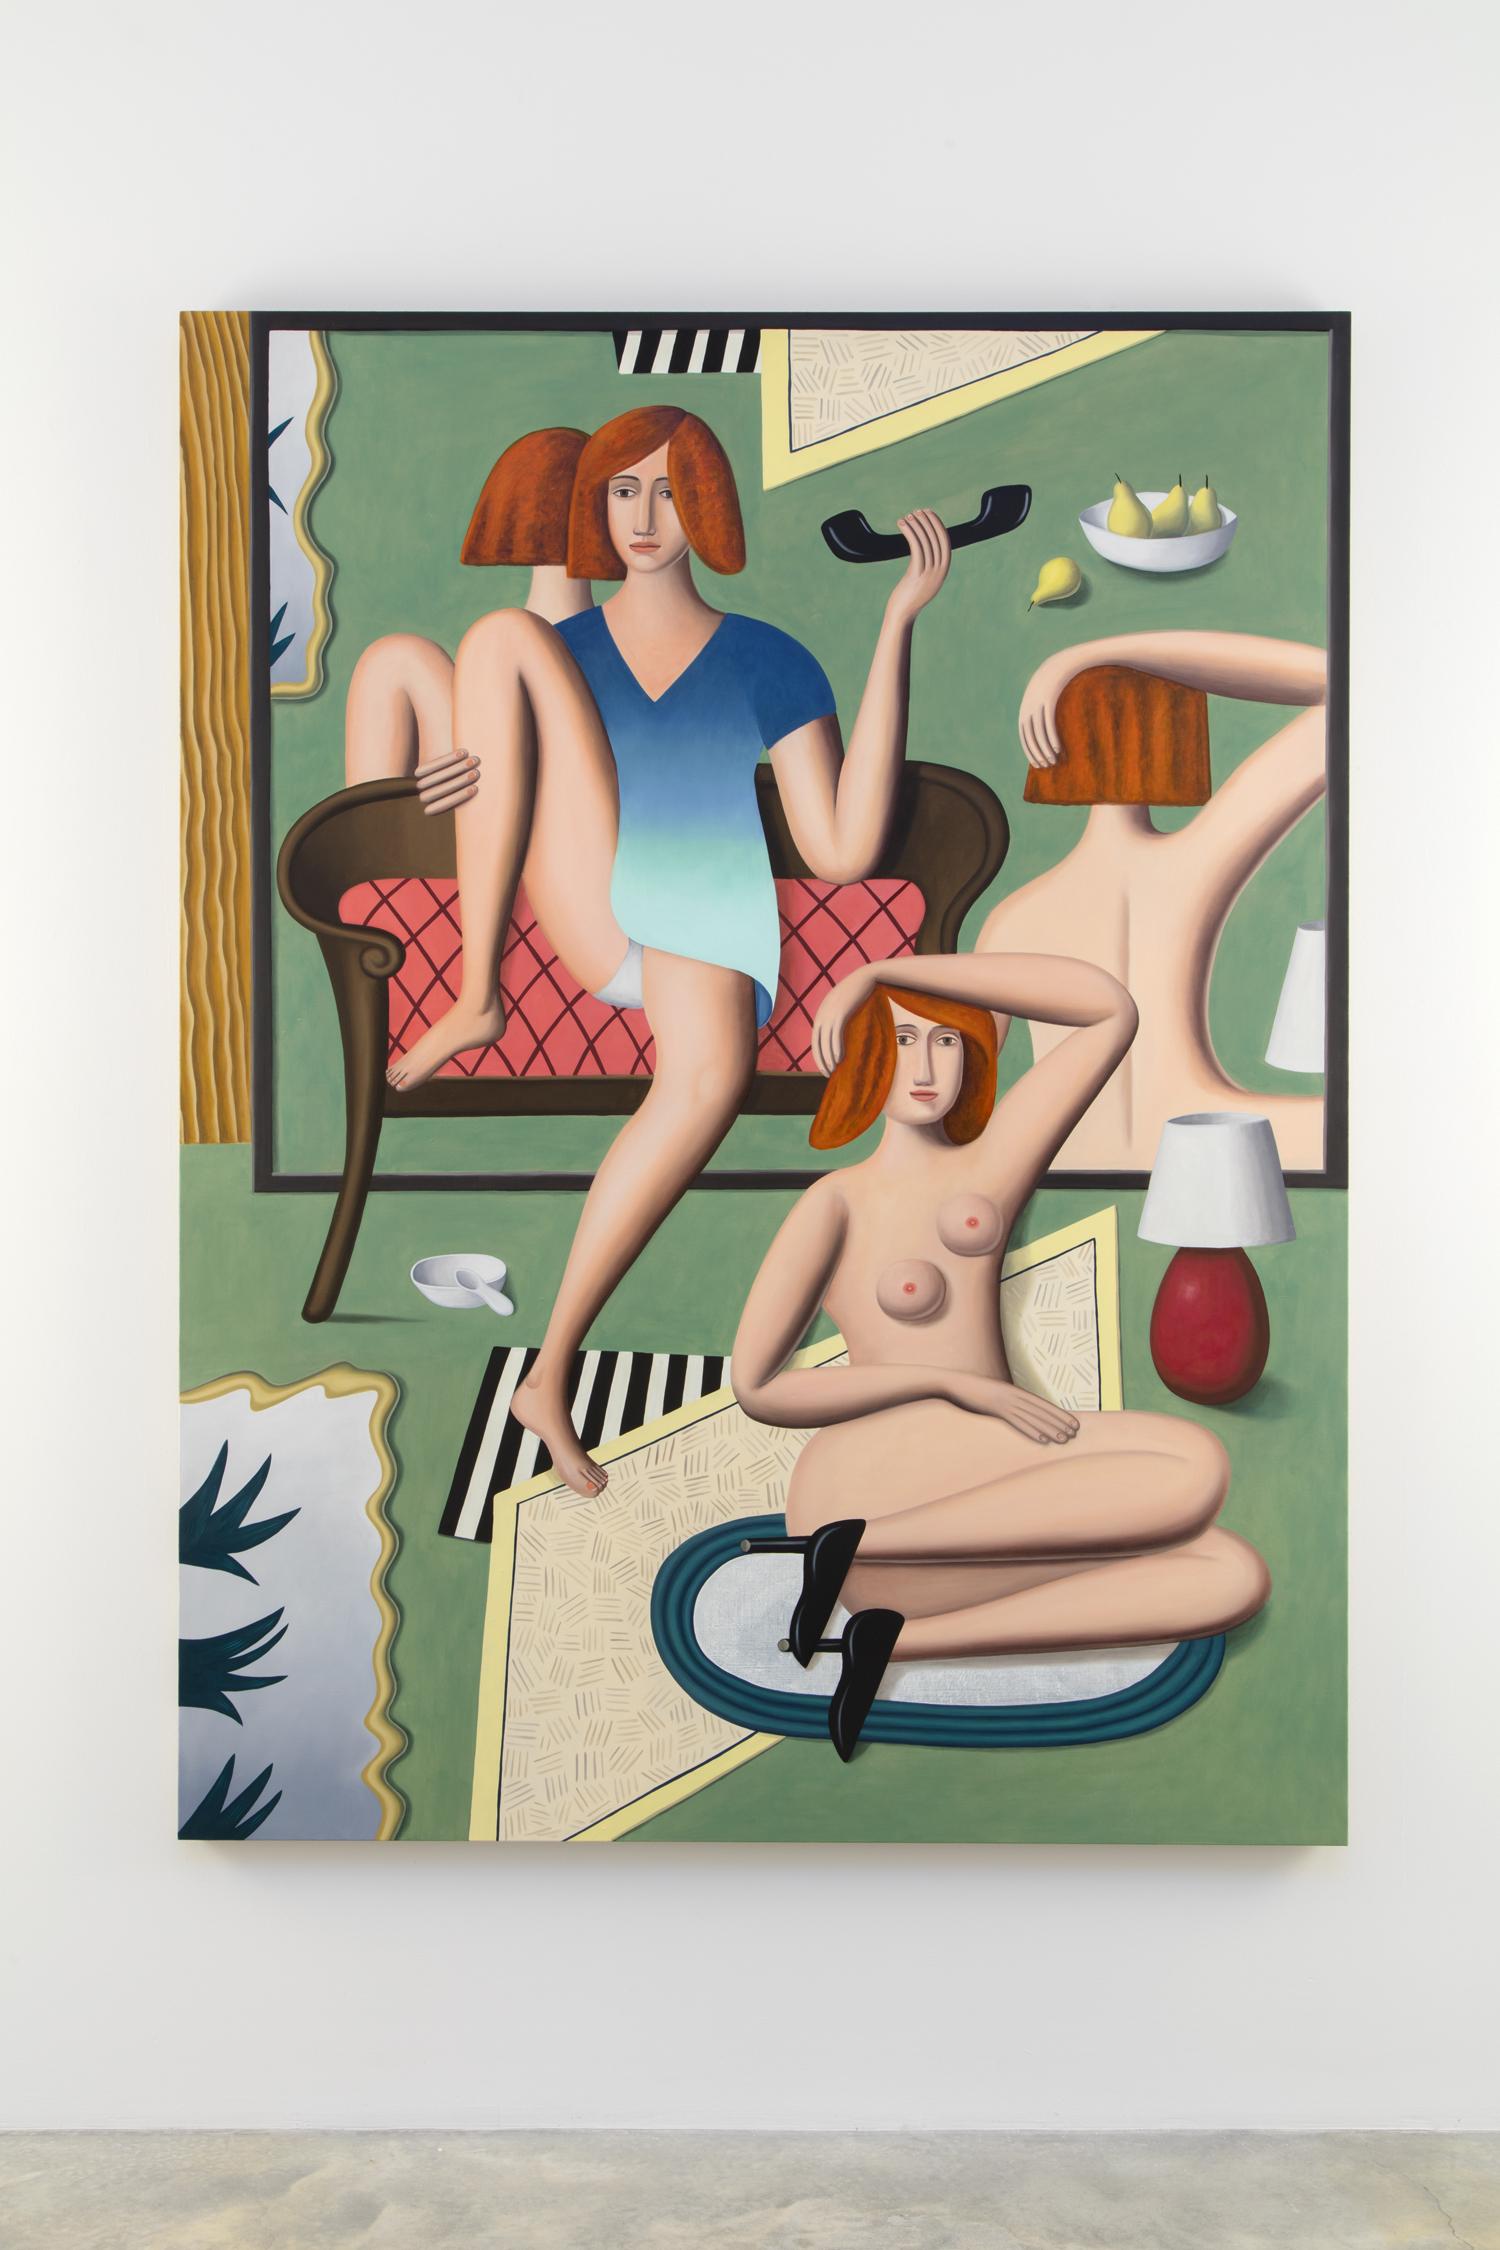 "Jonathan Gardner, In the Mirror, 2016, Oil on linen, 68 x 52"" / 172.72 x 132.08cm. Photo: Jean Vong"